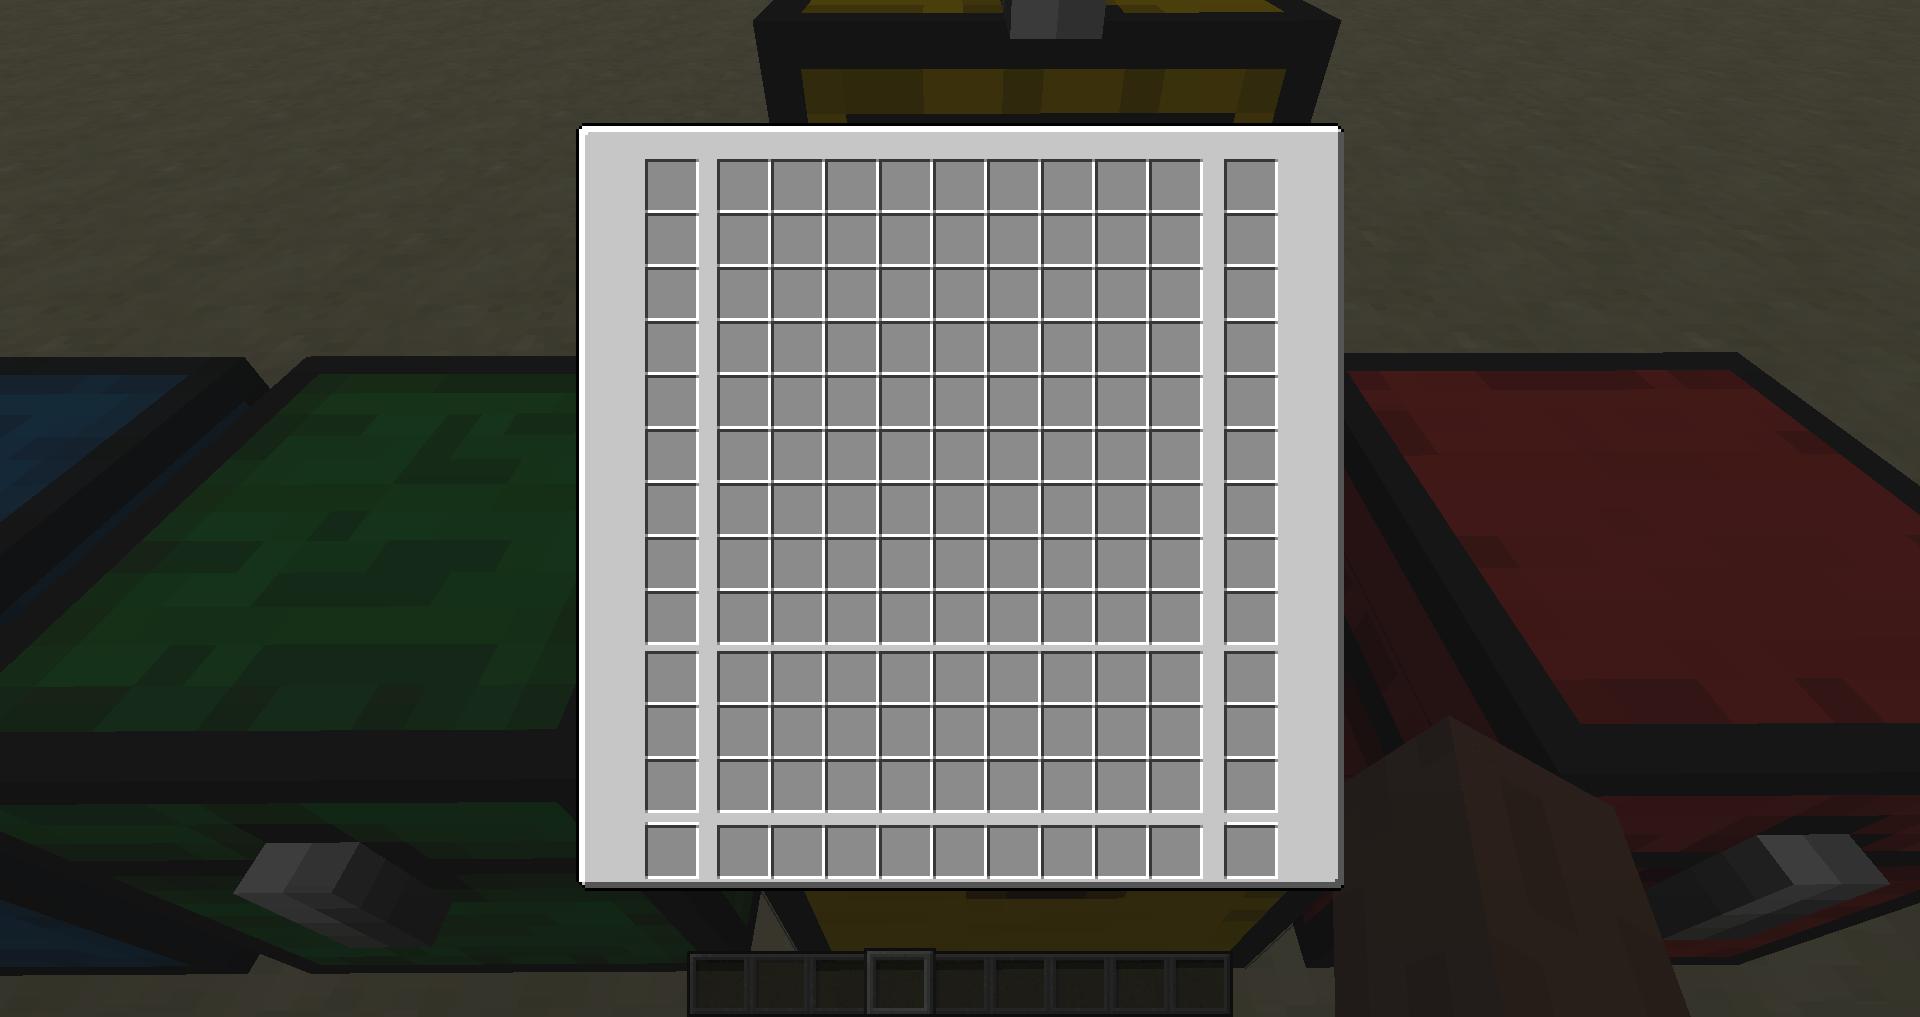 CompactChests-Mod-4.png